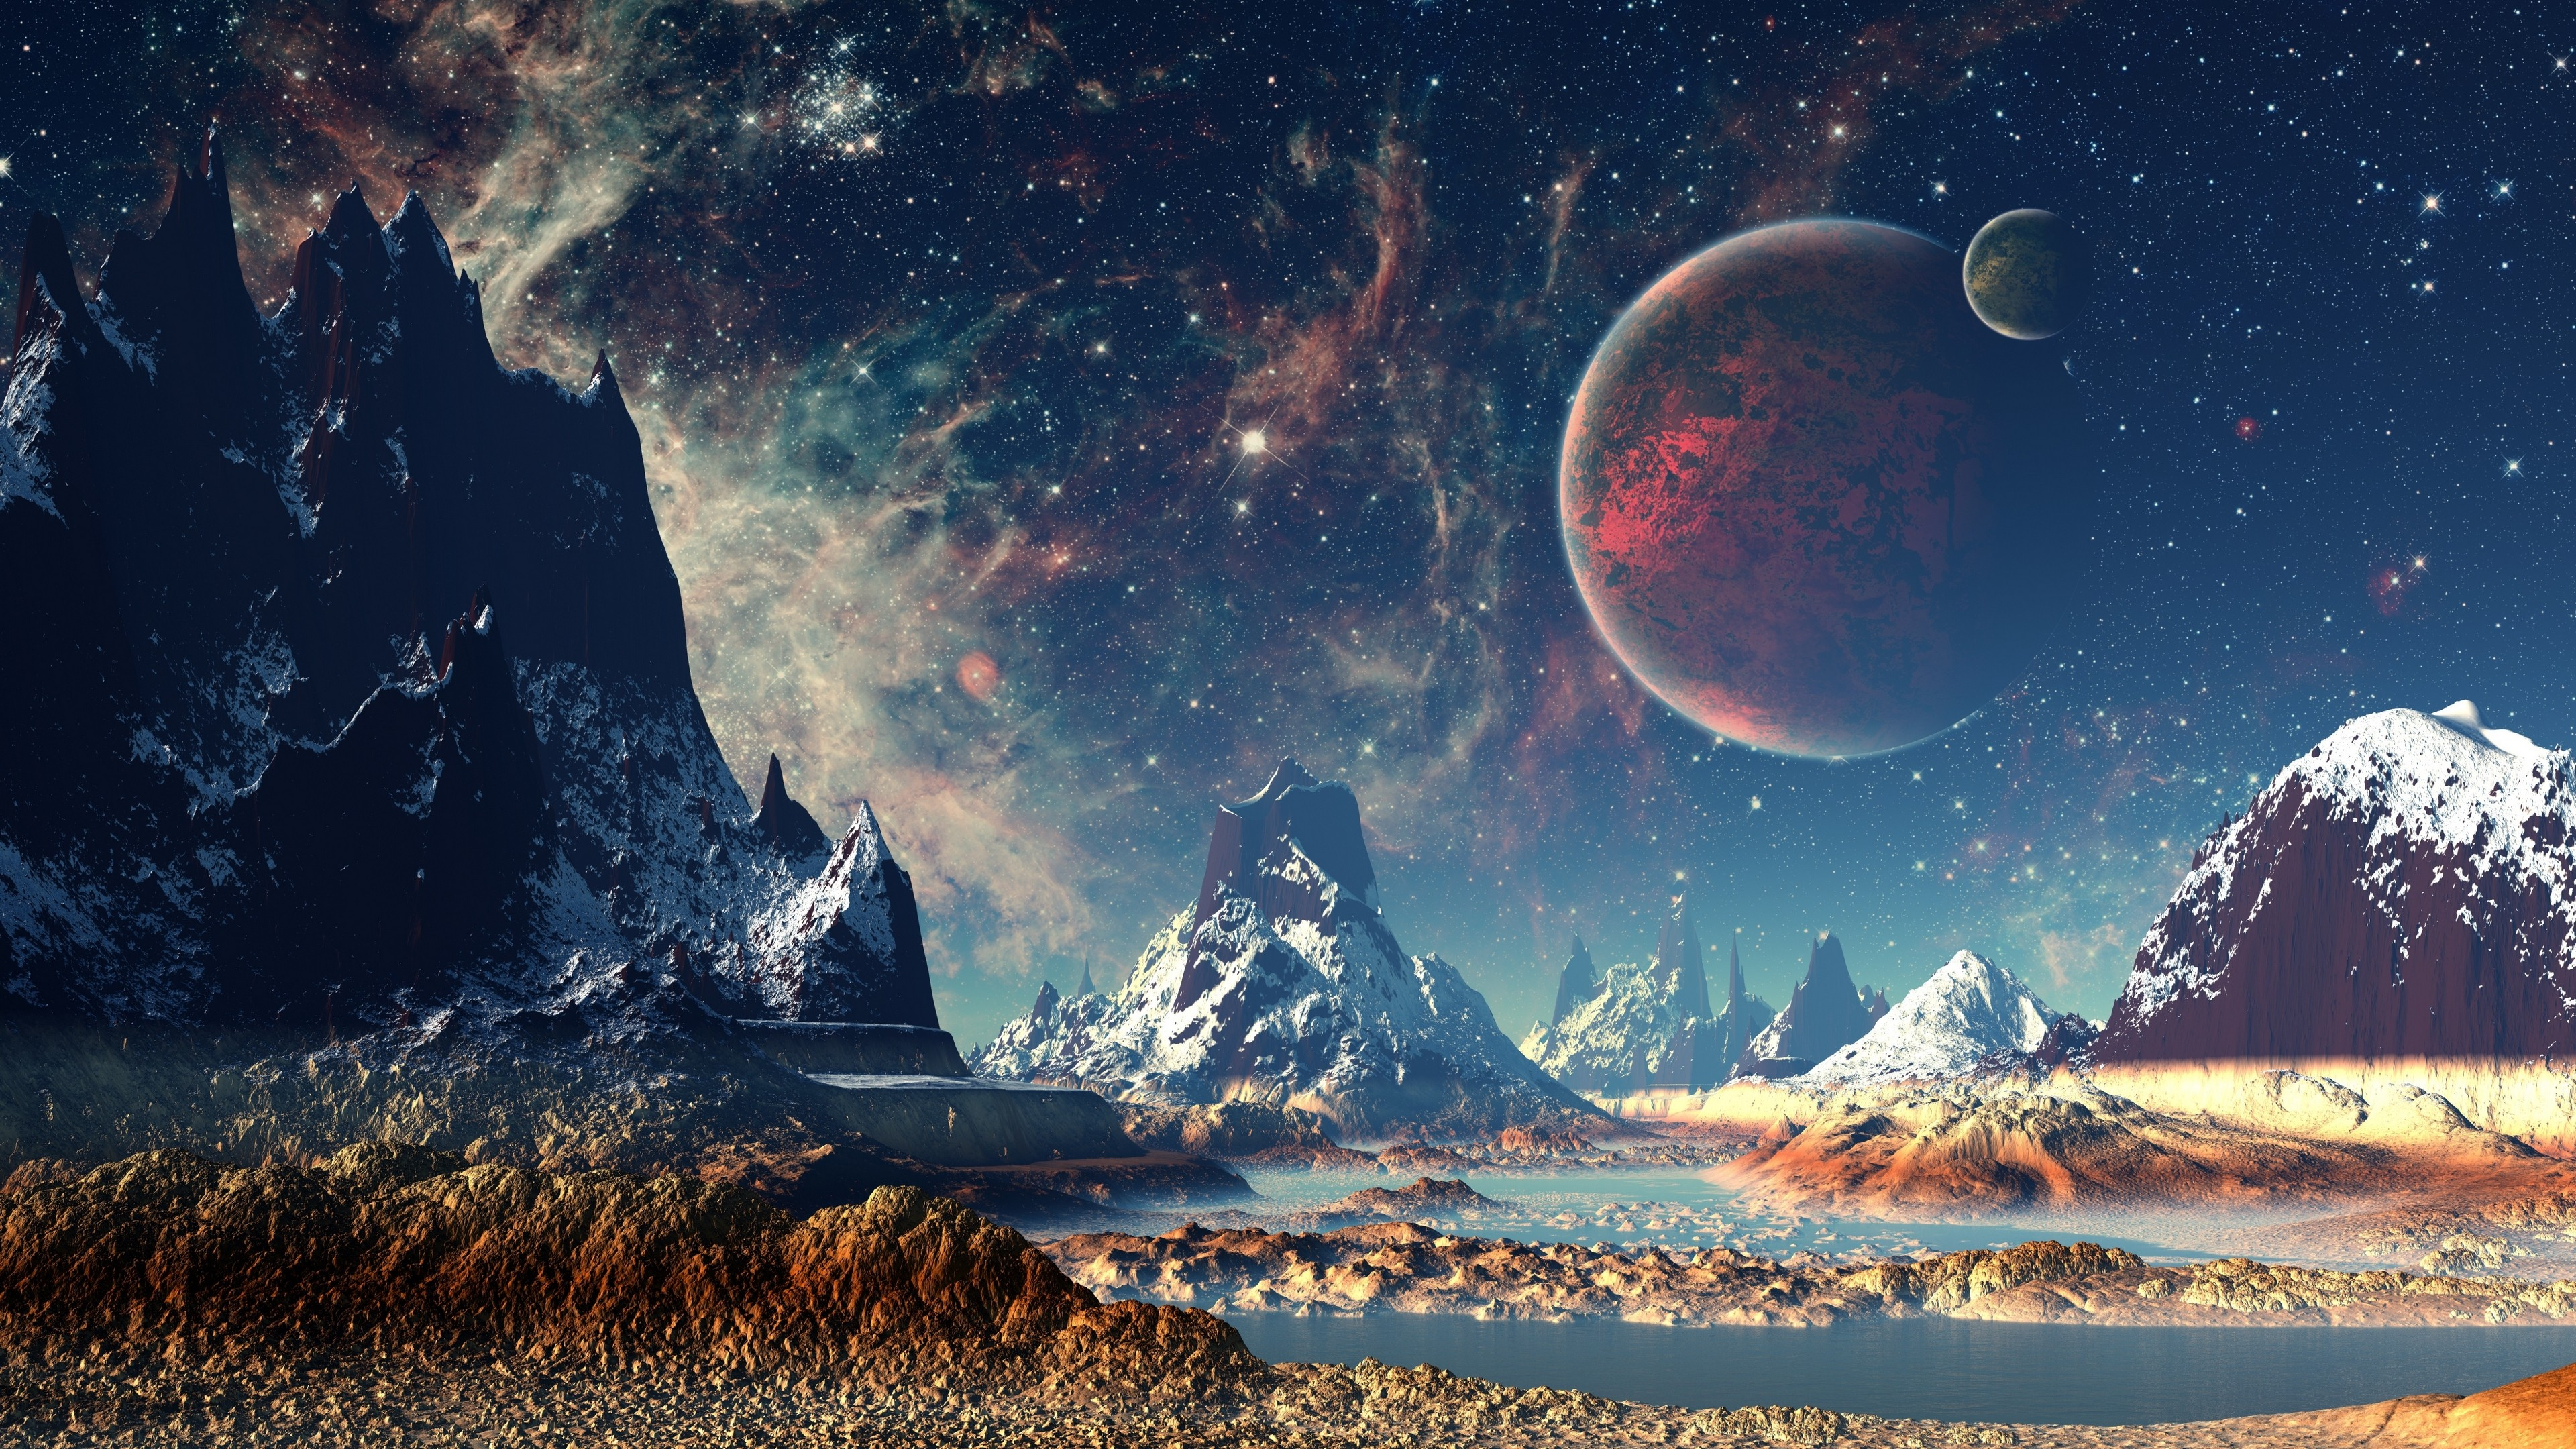 Mountains stars space planets digital art artwork 4k hd - 4k resolution space wallpaper ...